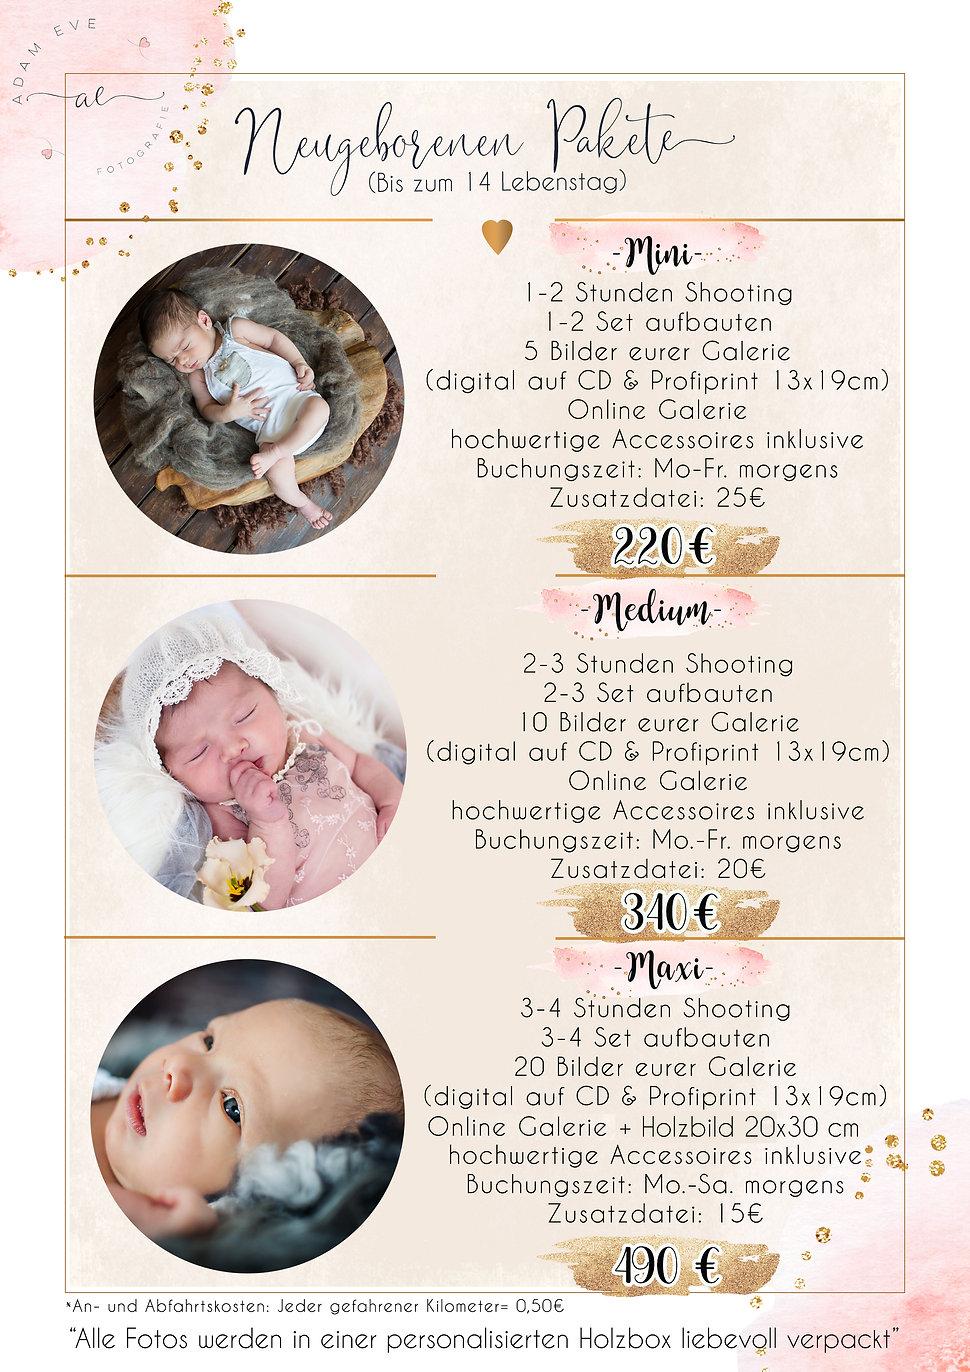 Preisliste_Newborn.jpg